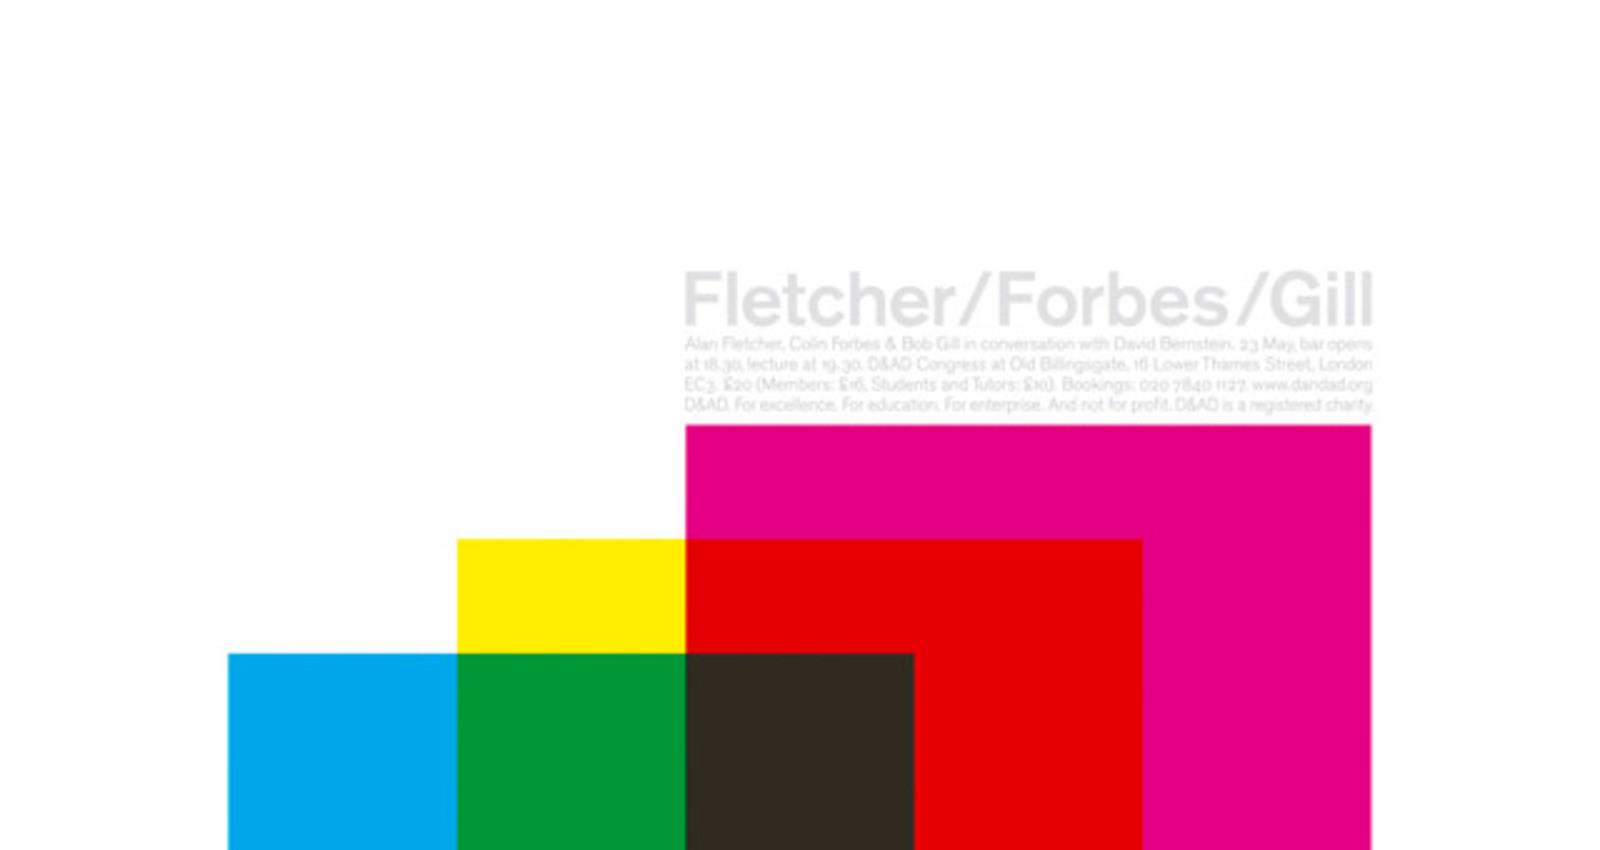 FLETCH FORBES GILL